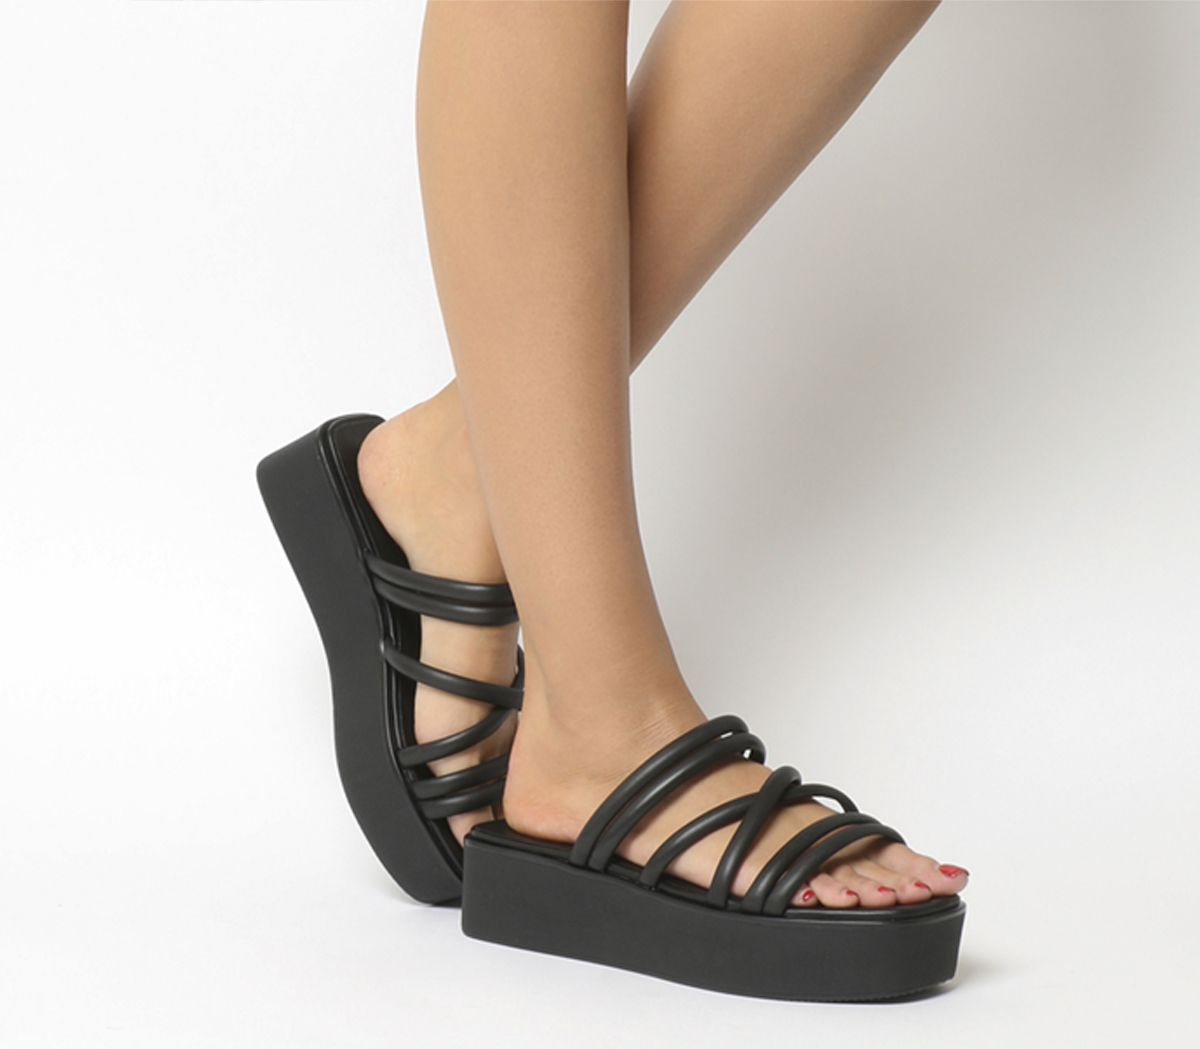 7cc39857d497 Vagabond Bonnie Wedge Black - Sandals